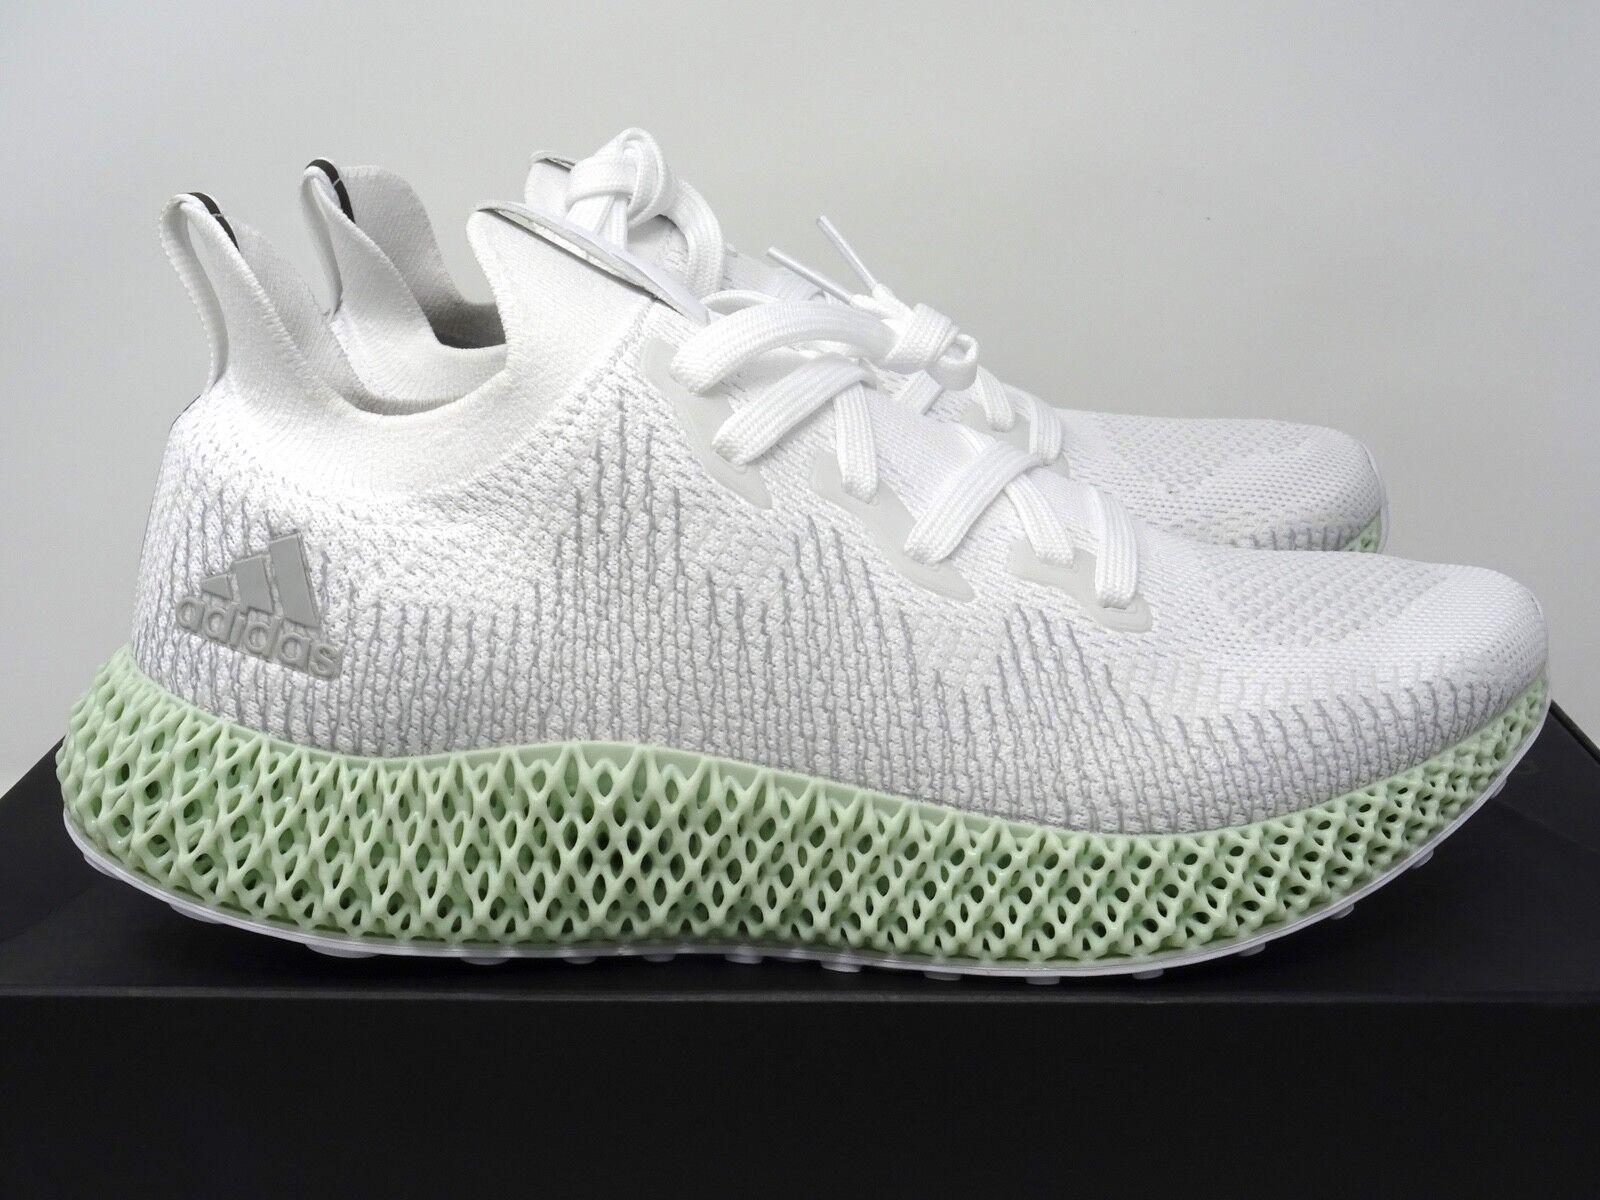 Adidas AlphaEdge 4D Printed FutureCraft White Green UK 5 8 9 11 12 US